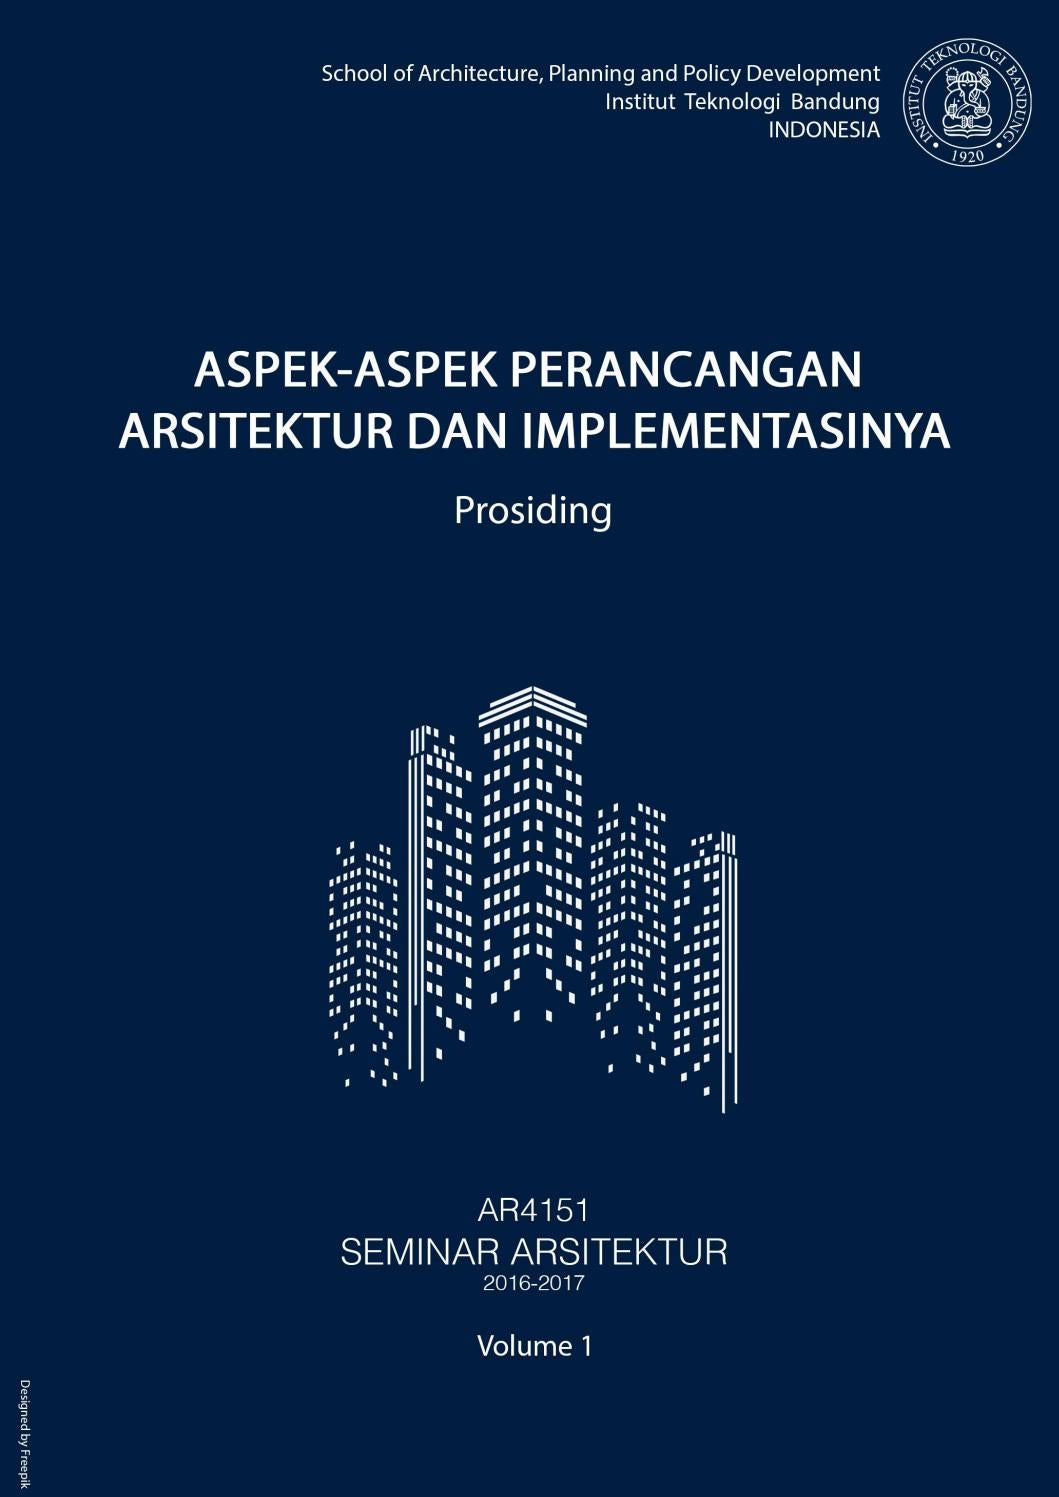 AR4151 Seminar Arsitektur Semester I 2017 2018 By Unit